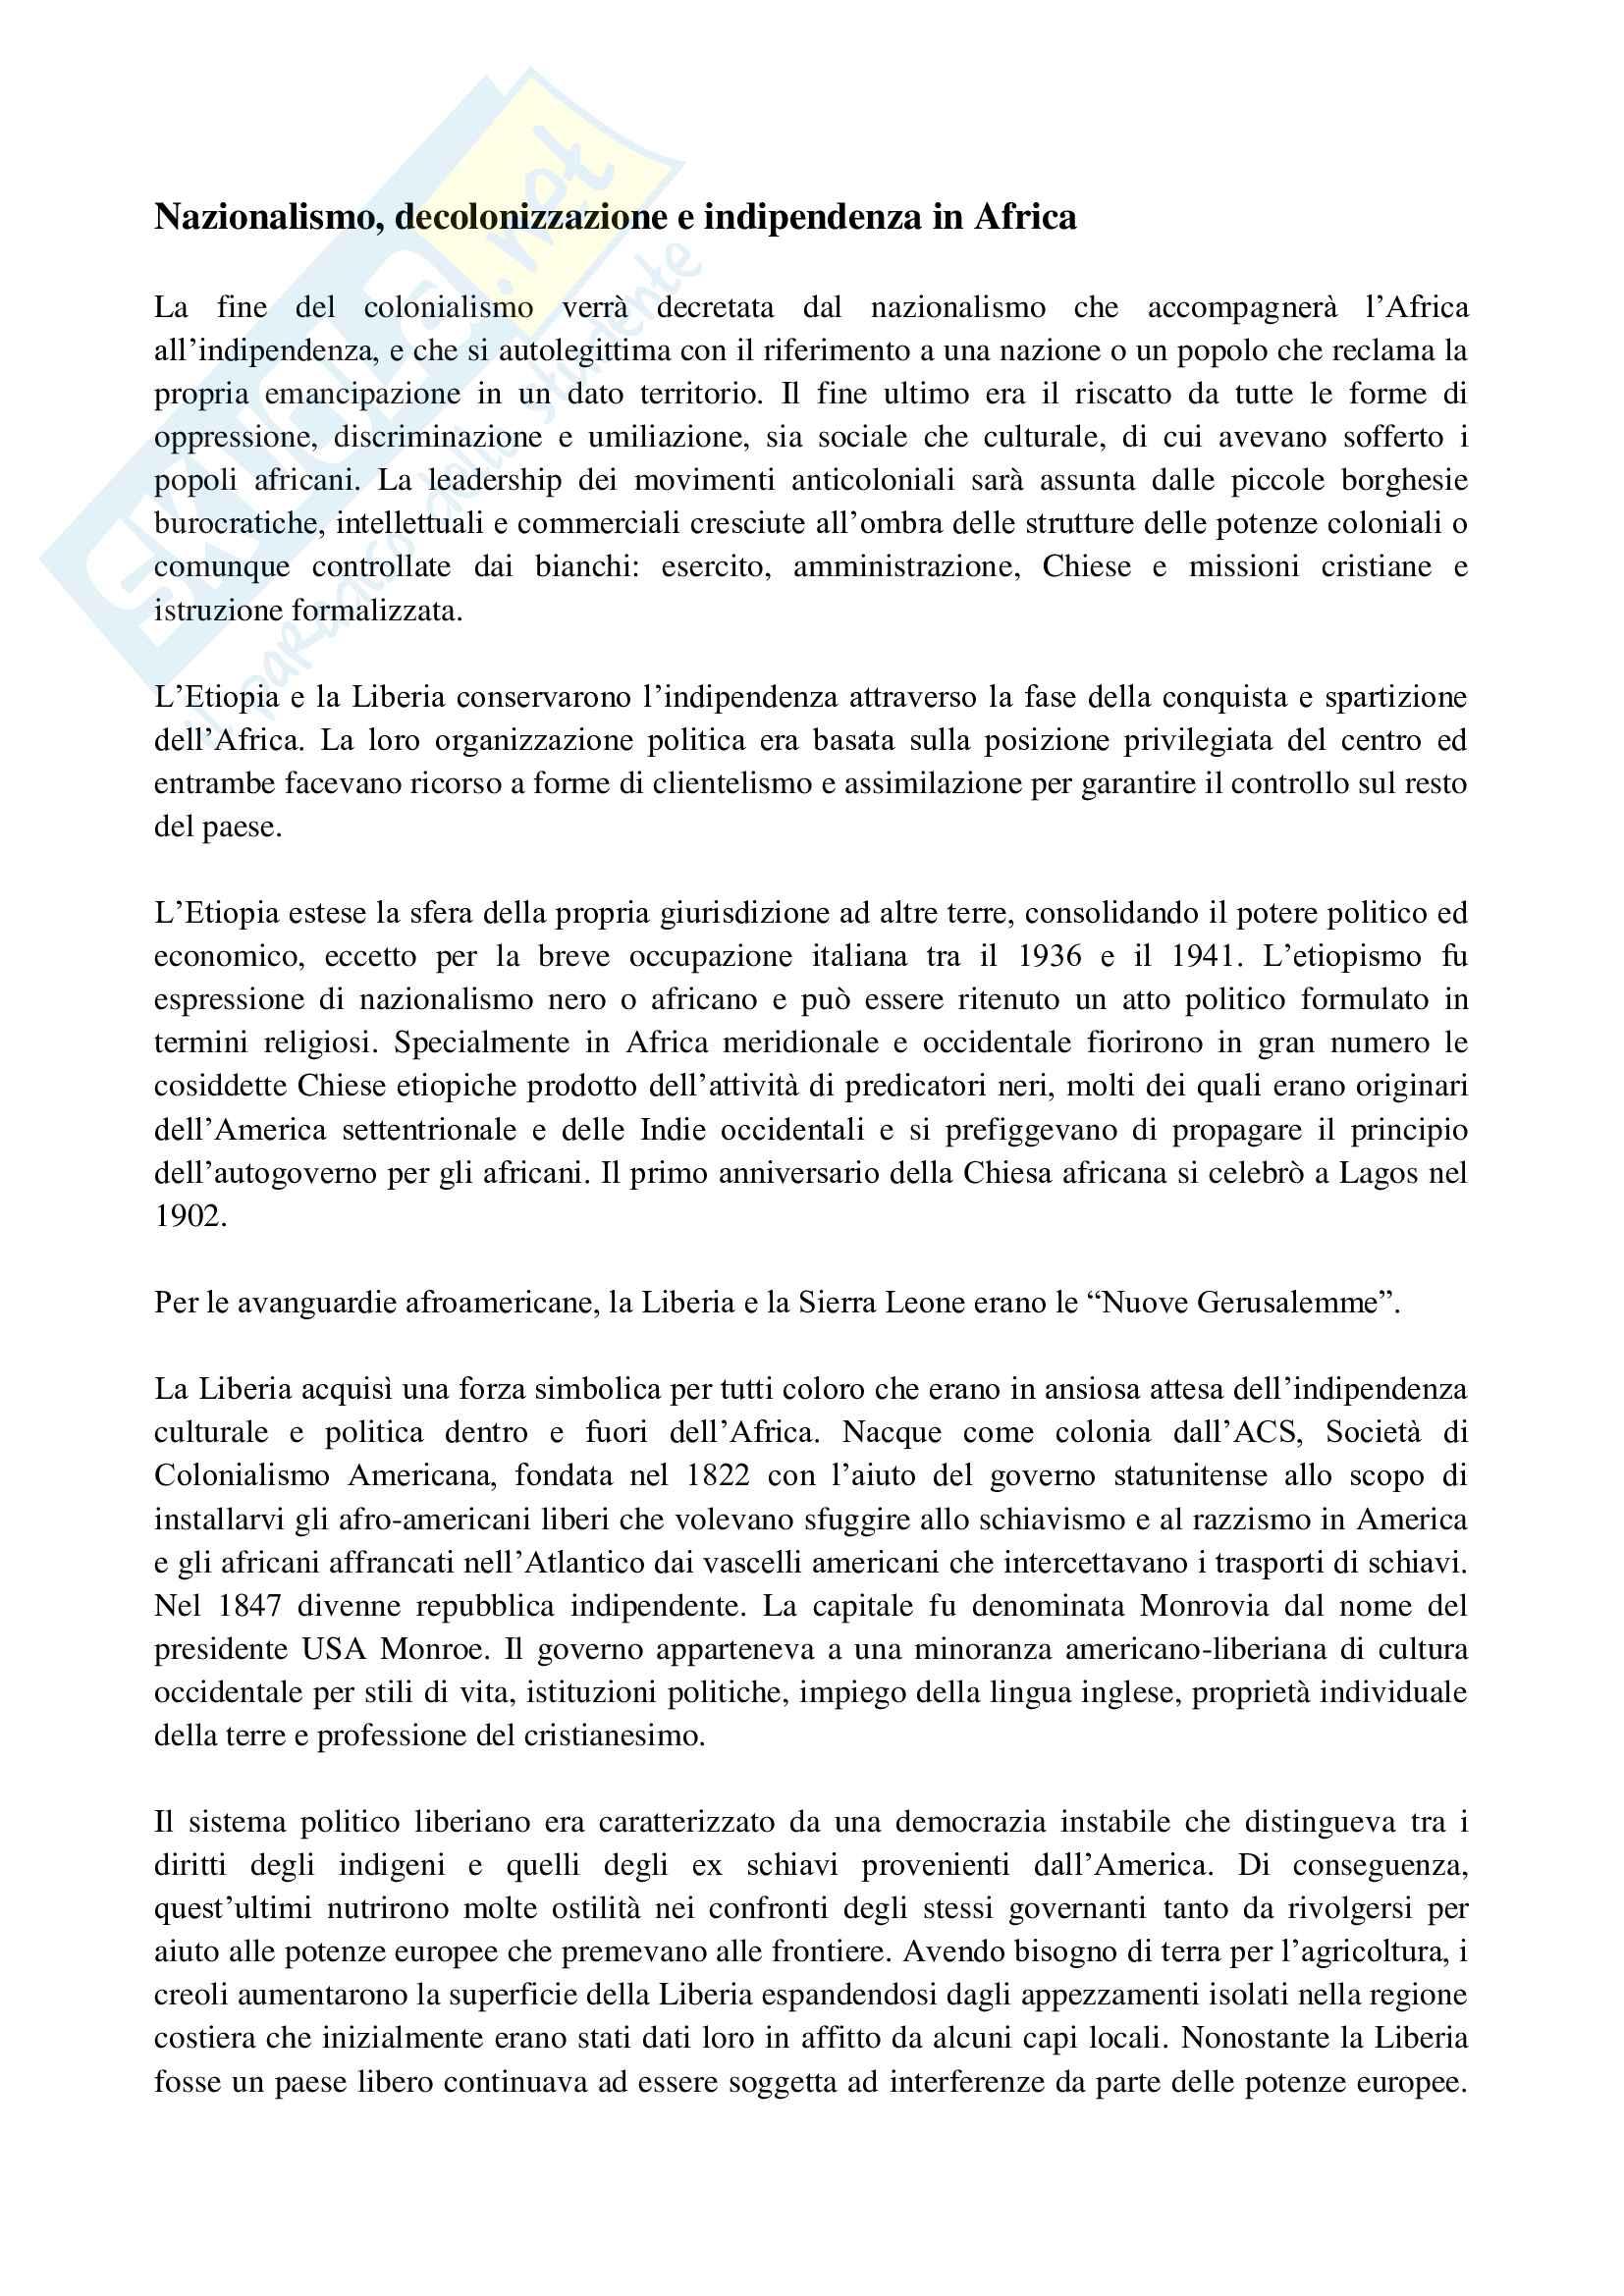 Appunti esame Storia e istituzioni dell'Africa, prof. Carcangiu, Nazionalismo, decolonizzazione e indipendenza in Africa